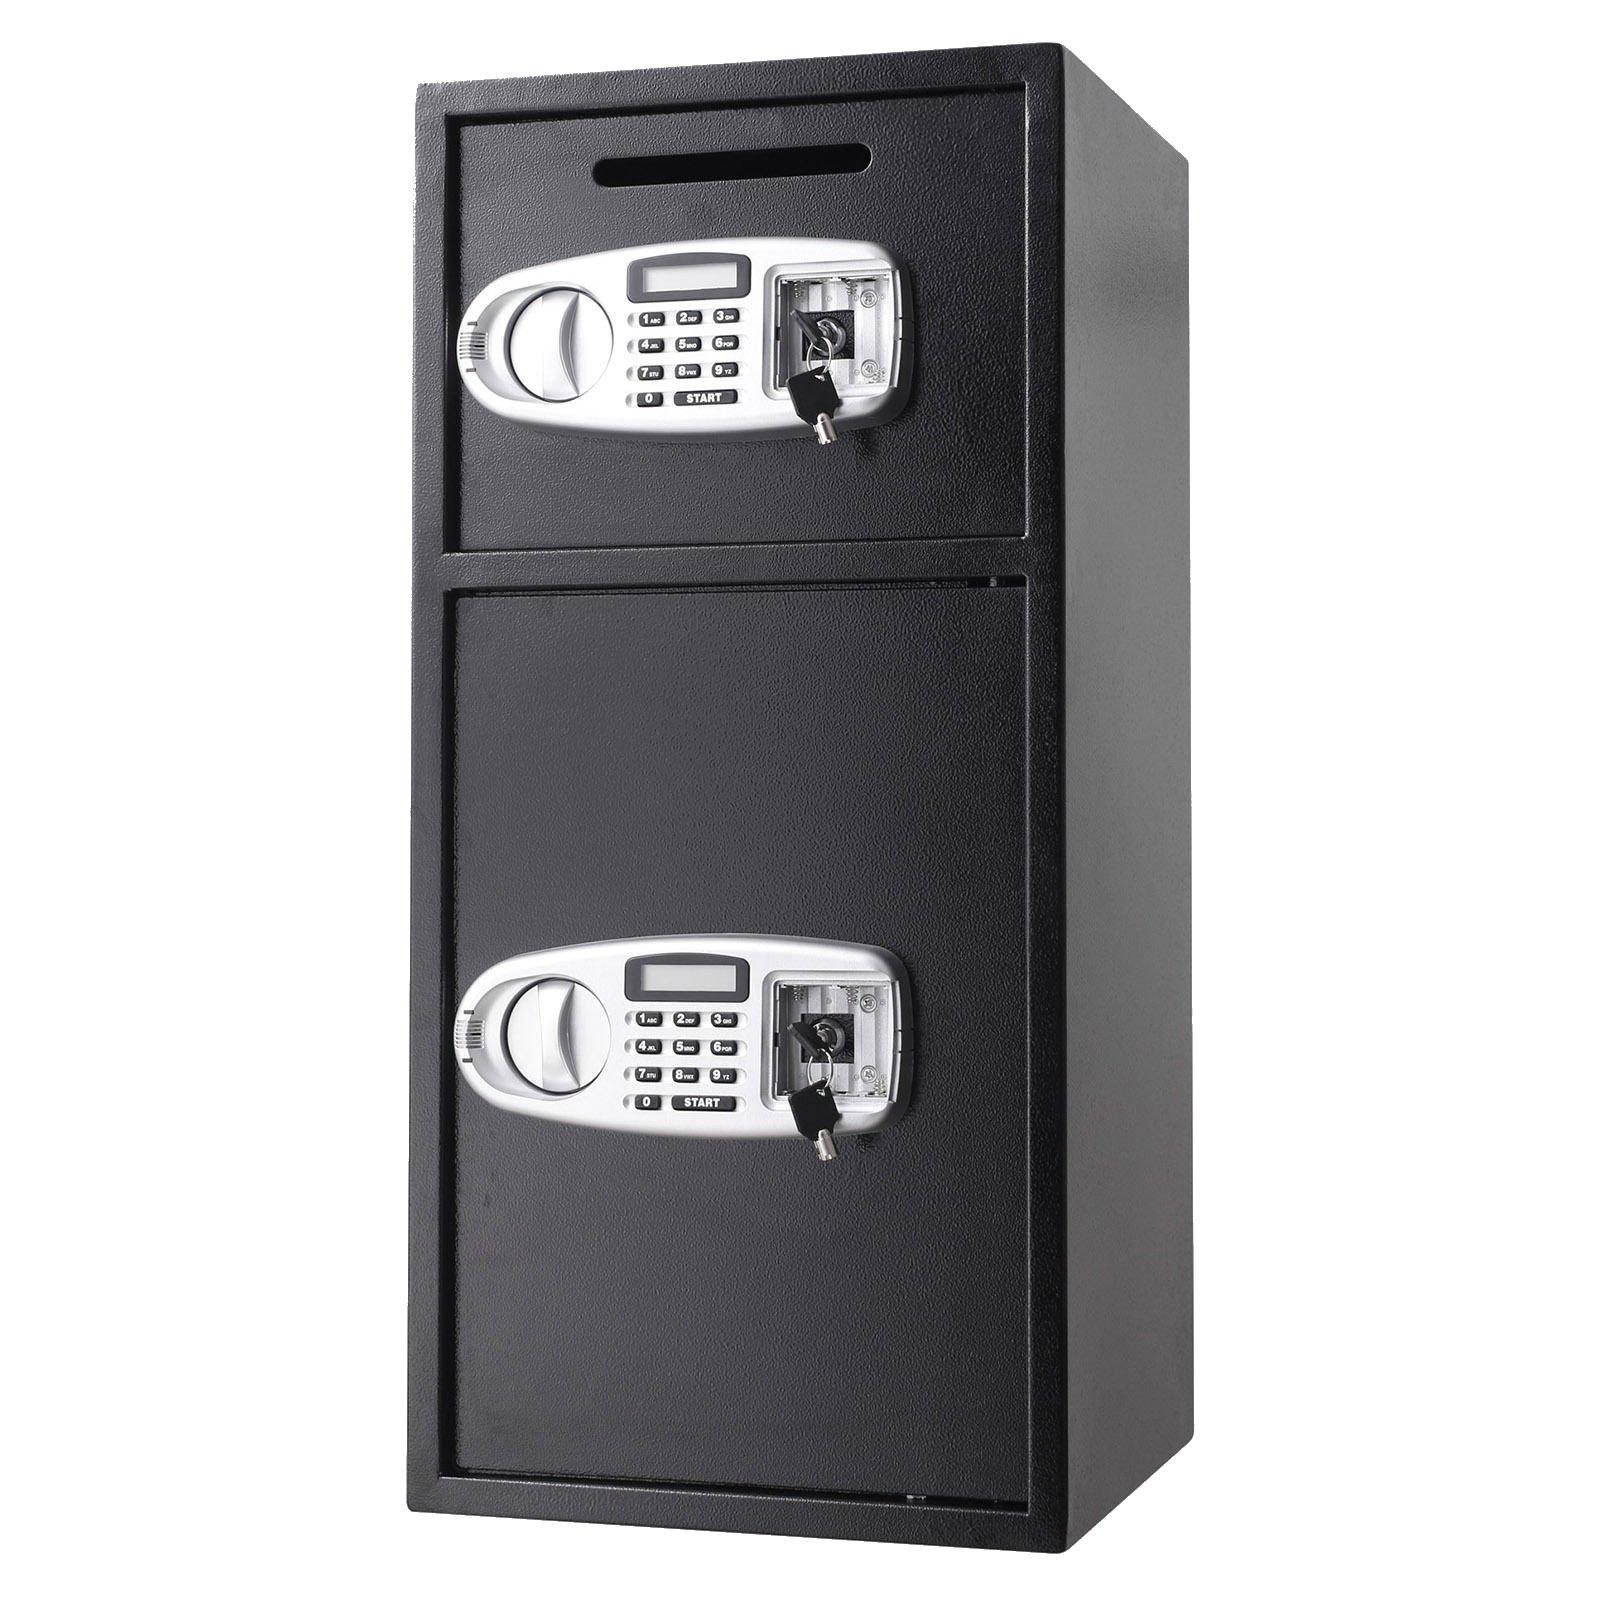 New Digital Double Door Safe Security Cash Money Jewelry Gun Book Deposit Drop Slot Lock Box With Electronic Combination Lock And Keys | Cabinet Safe | Cash Safe | Deposit Safe